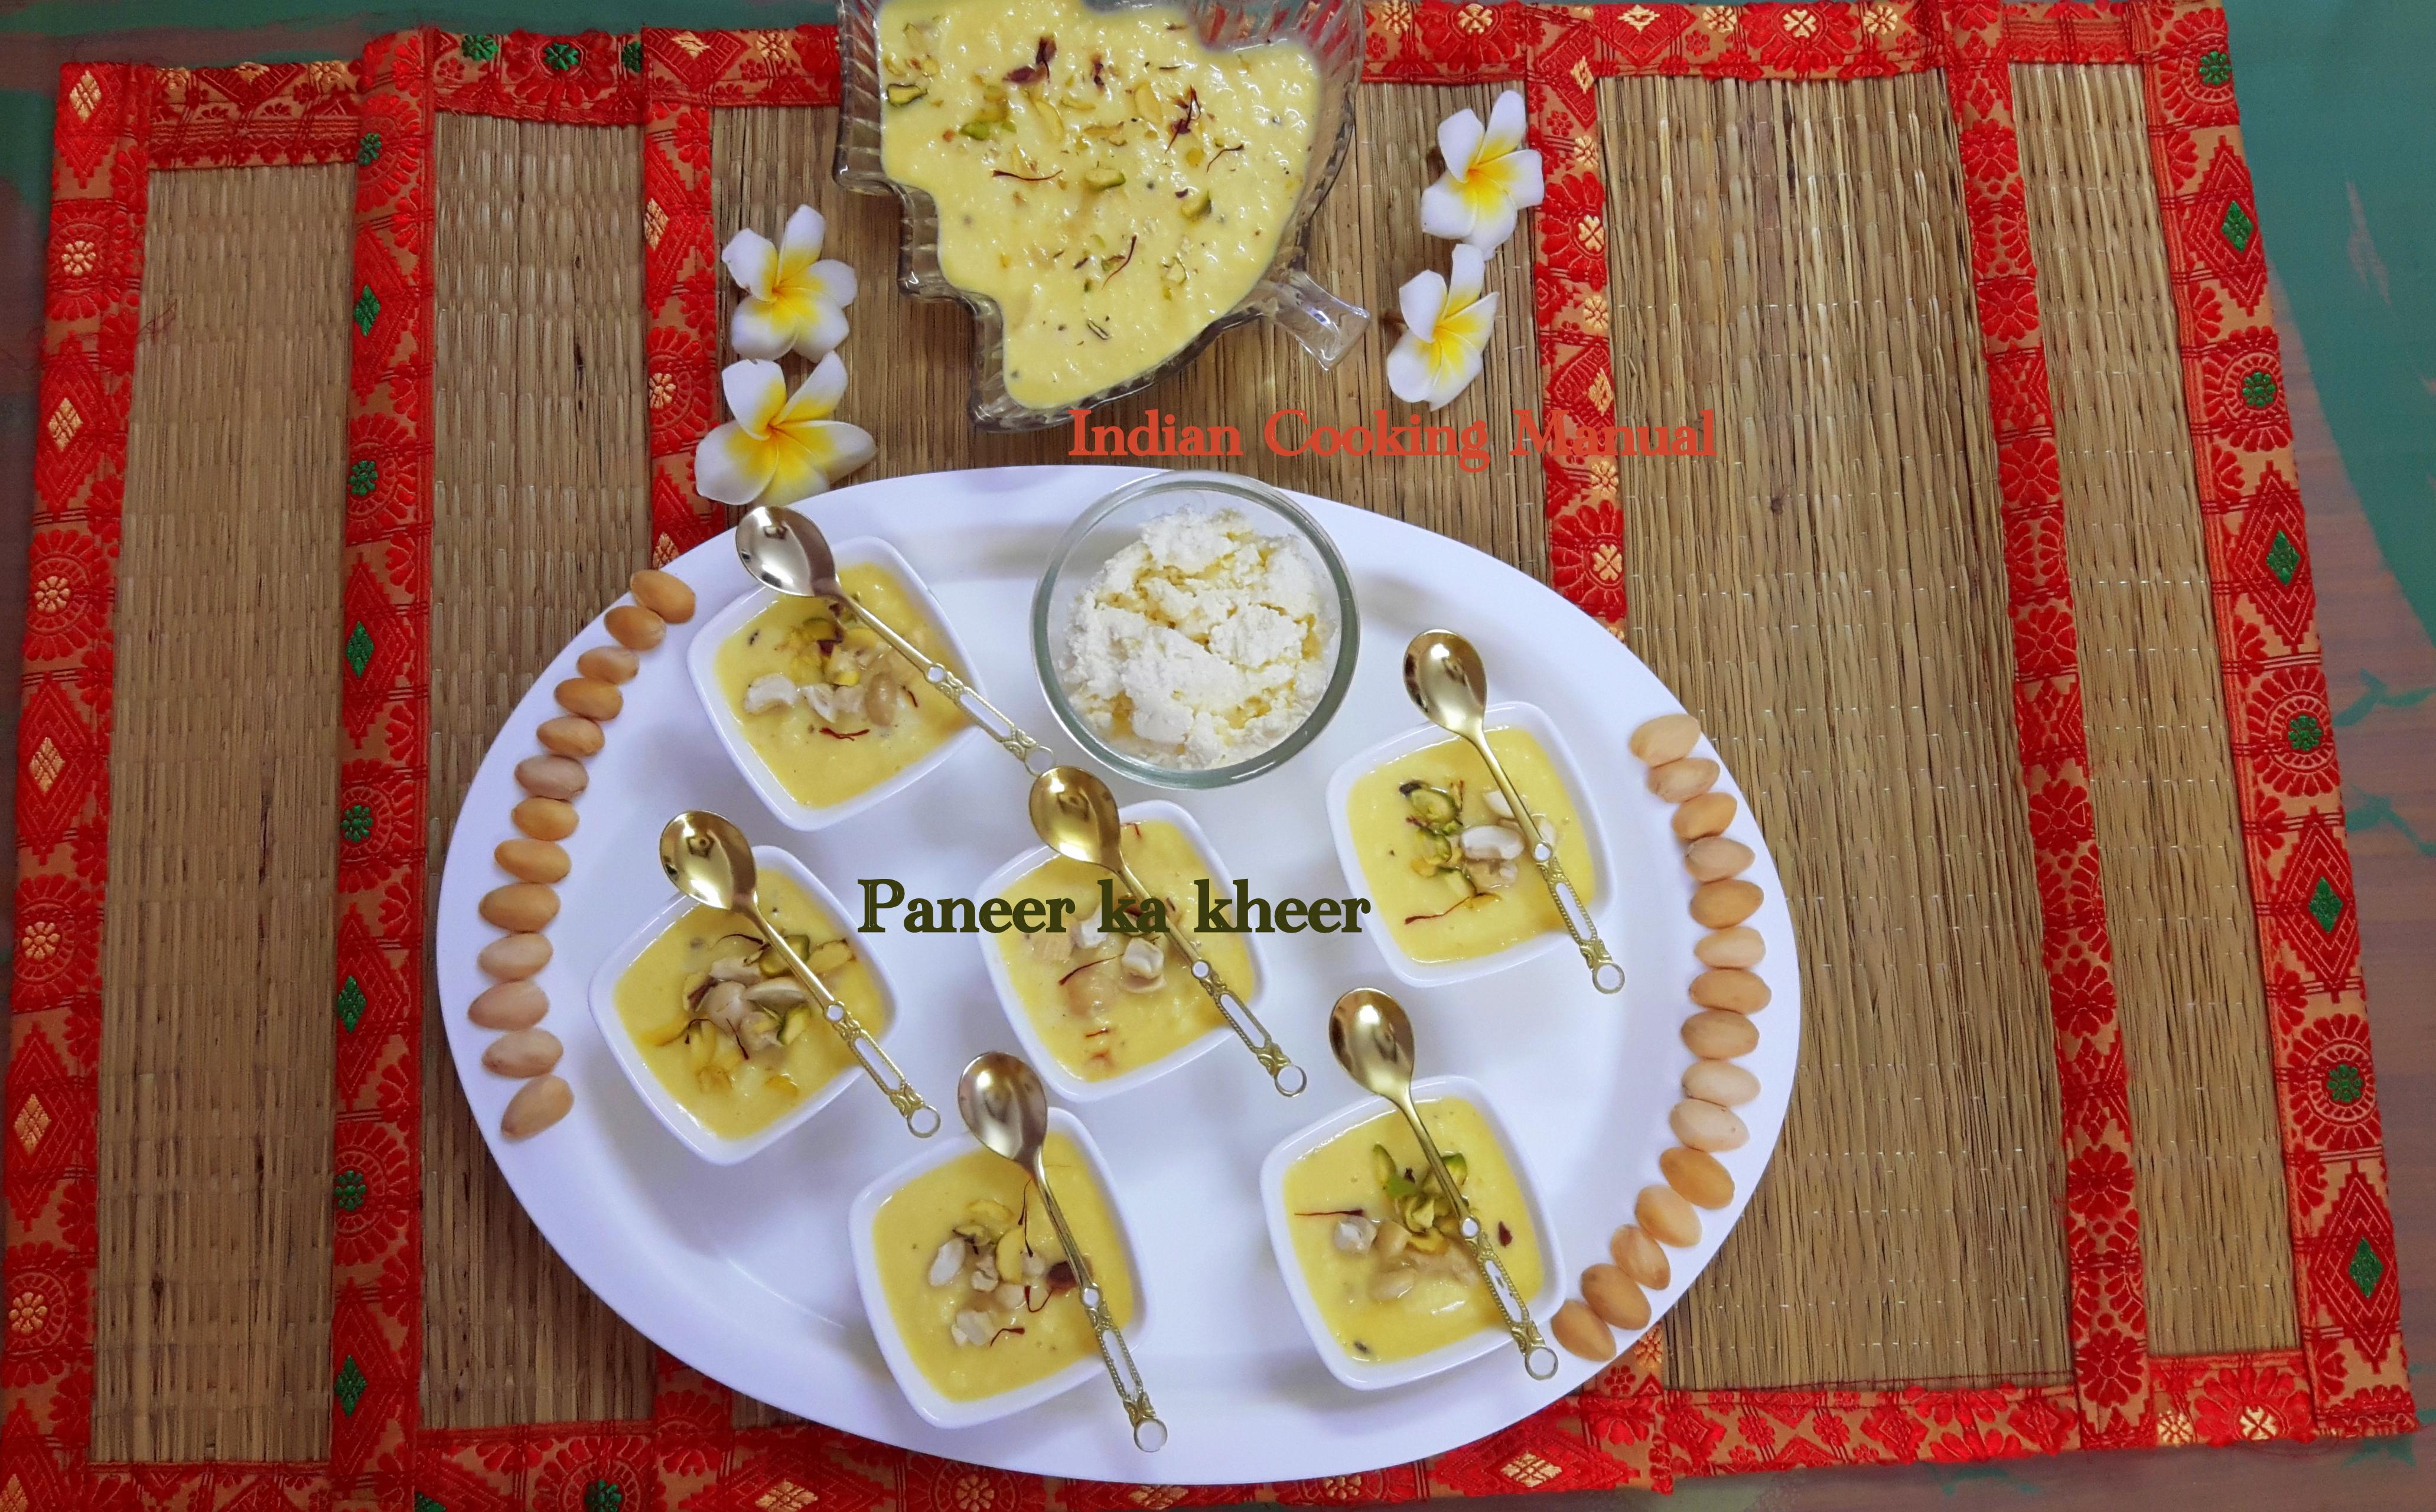 Paneer (cottage cheese) ka kheer